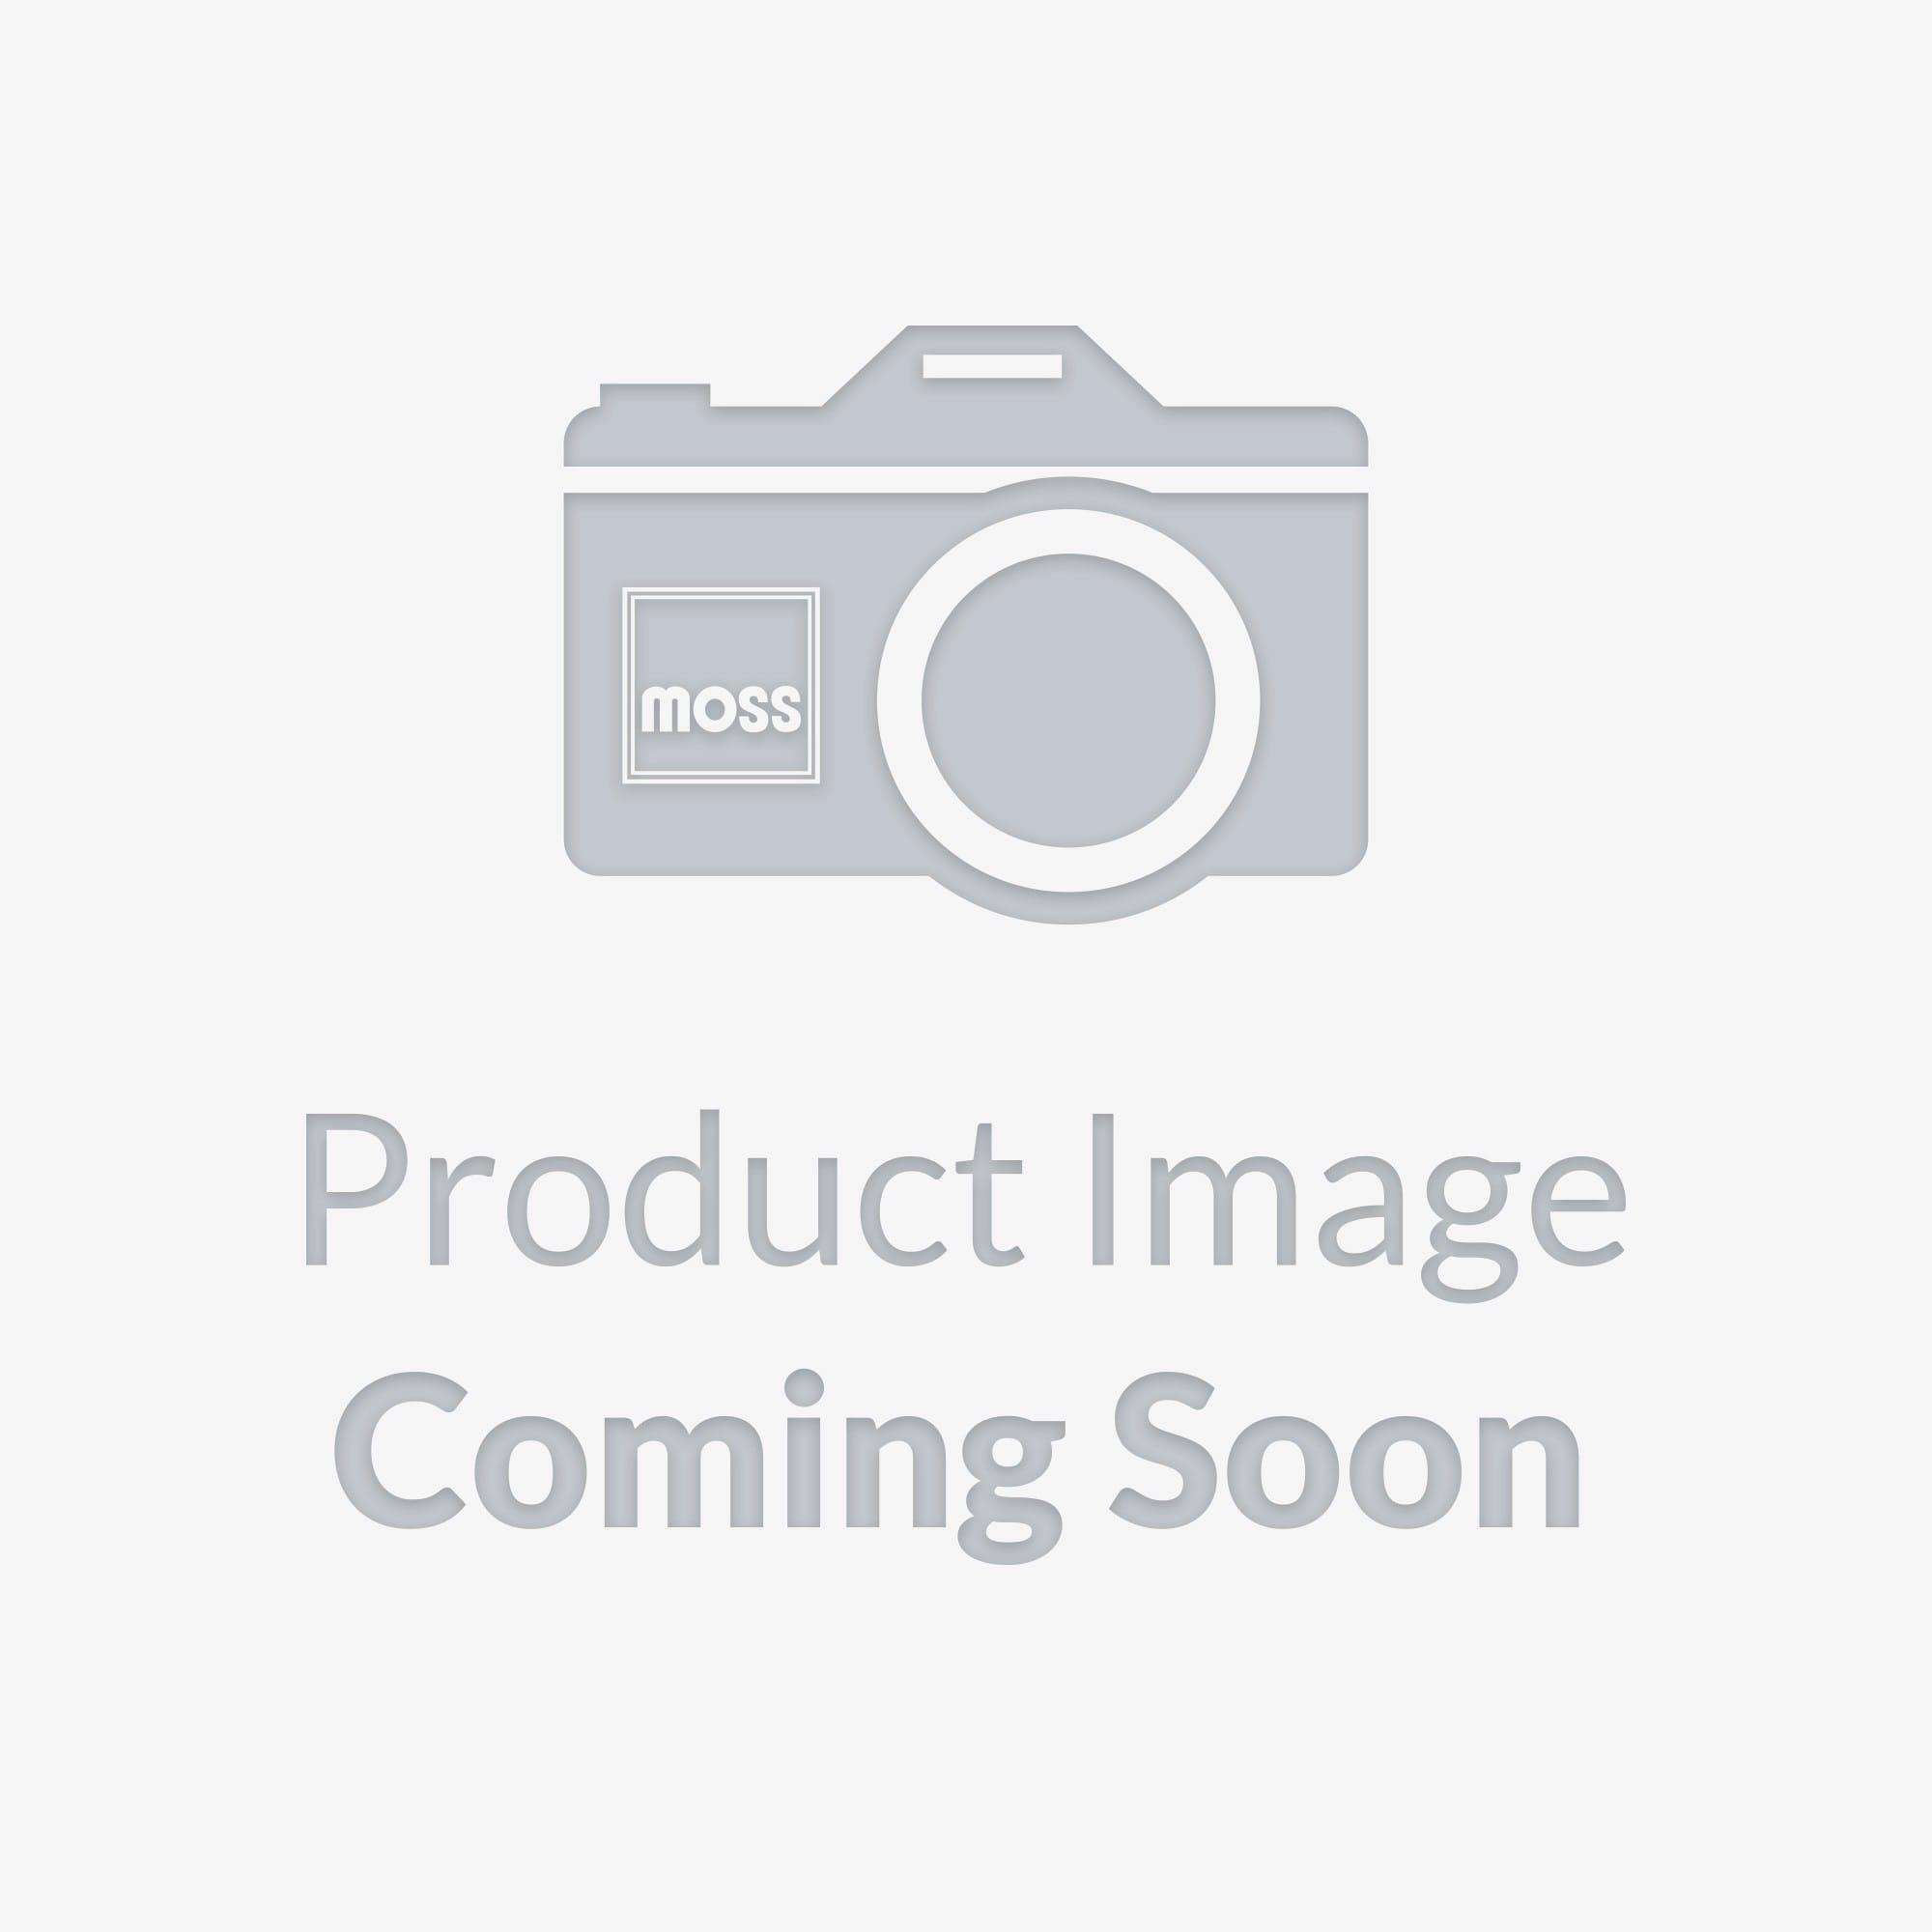 Aluminum Radiators by Mishimoto - Radiators, Belts & Hoses